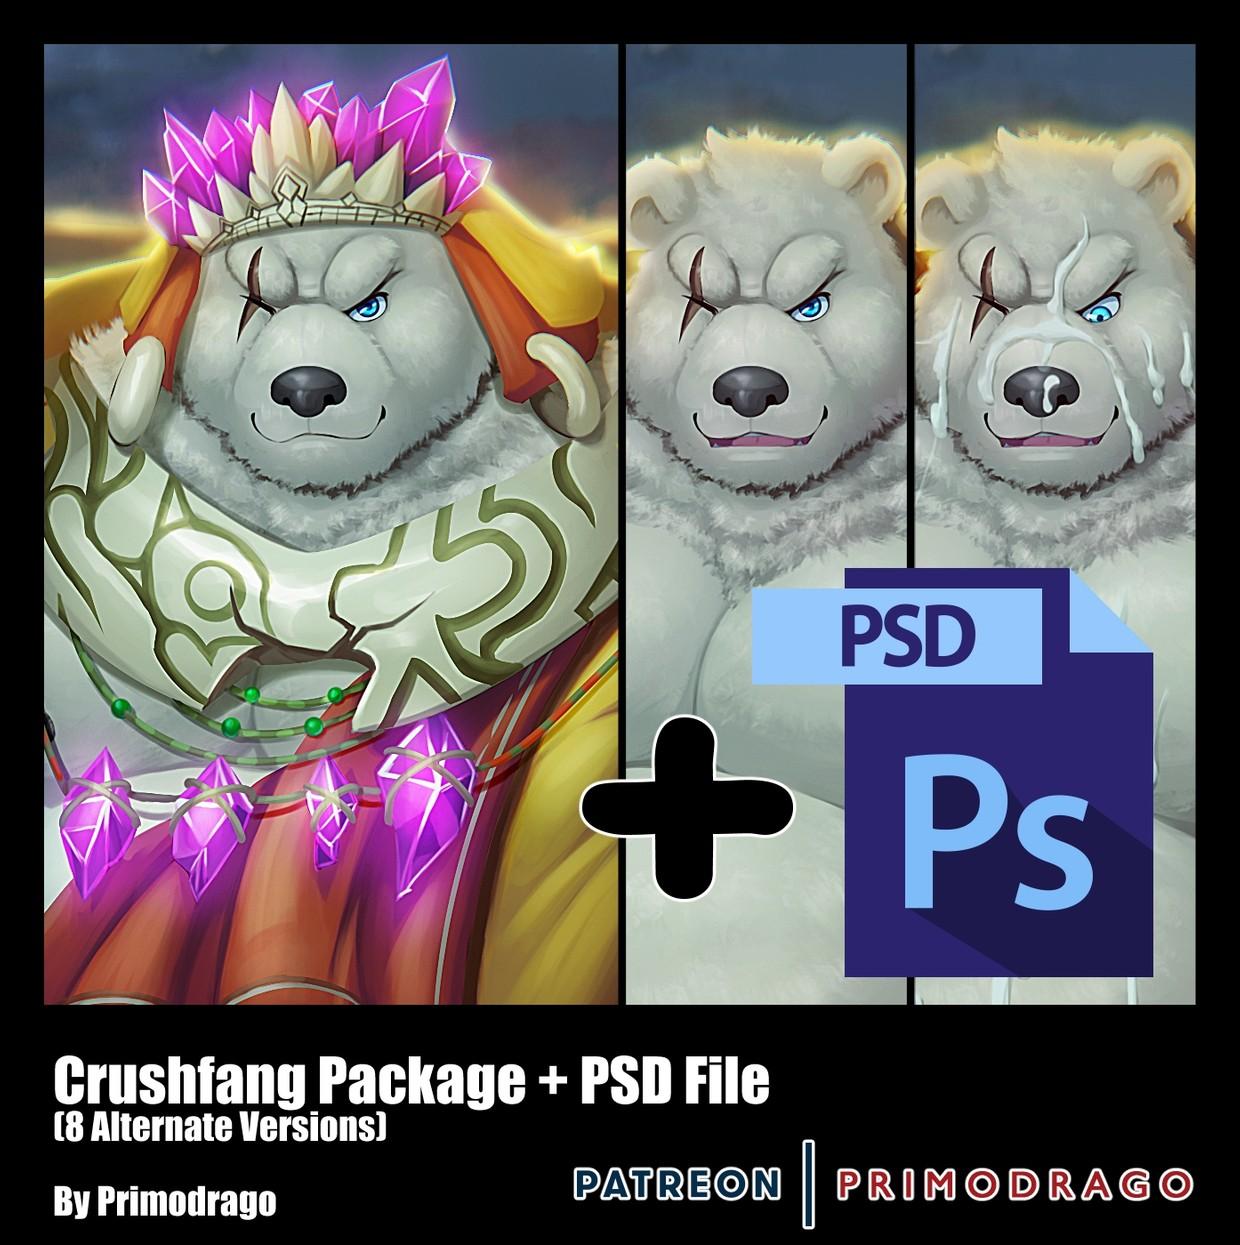 Crushfang Artpack + PSD File